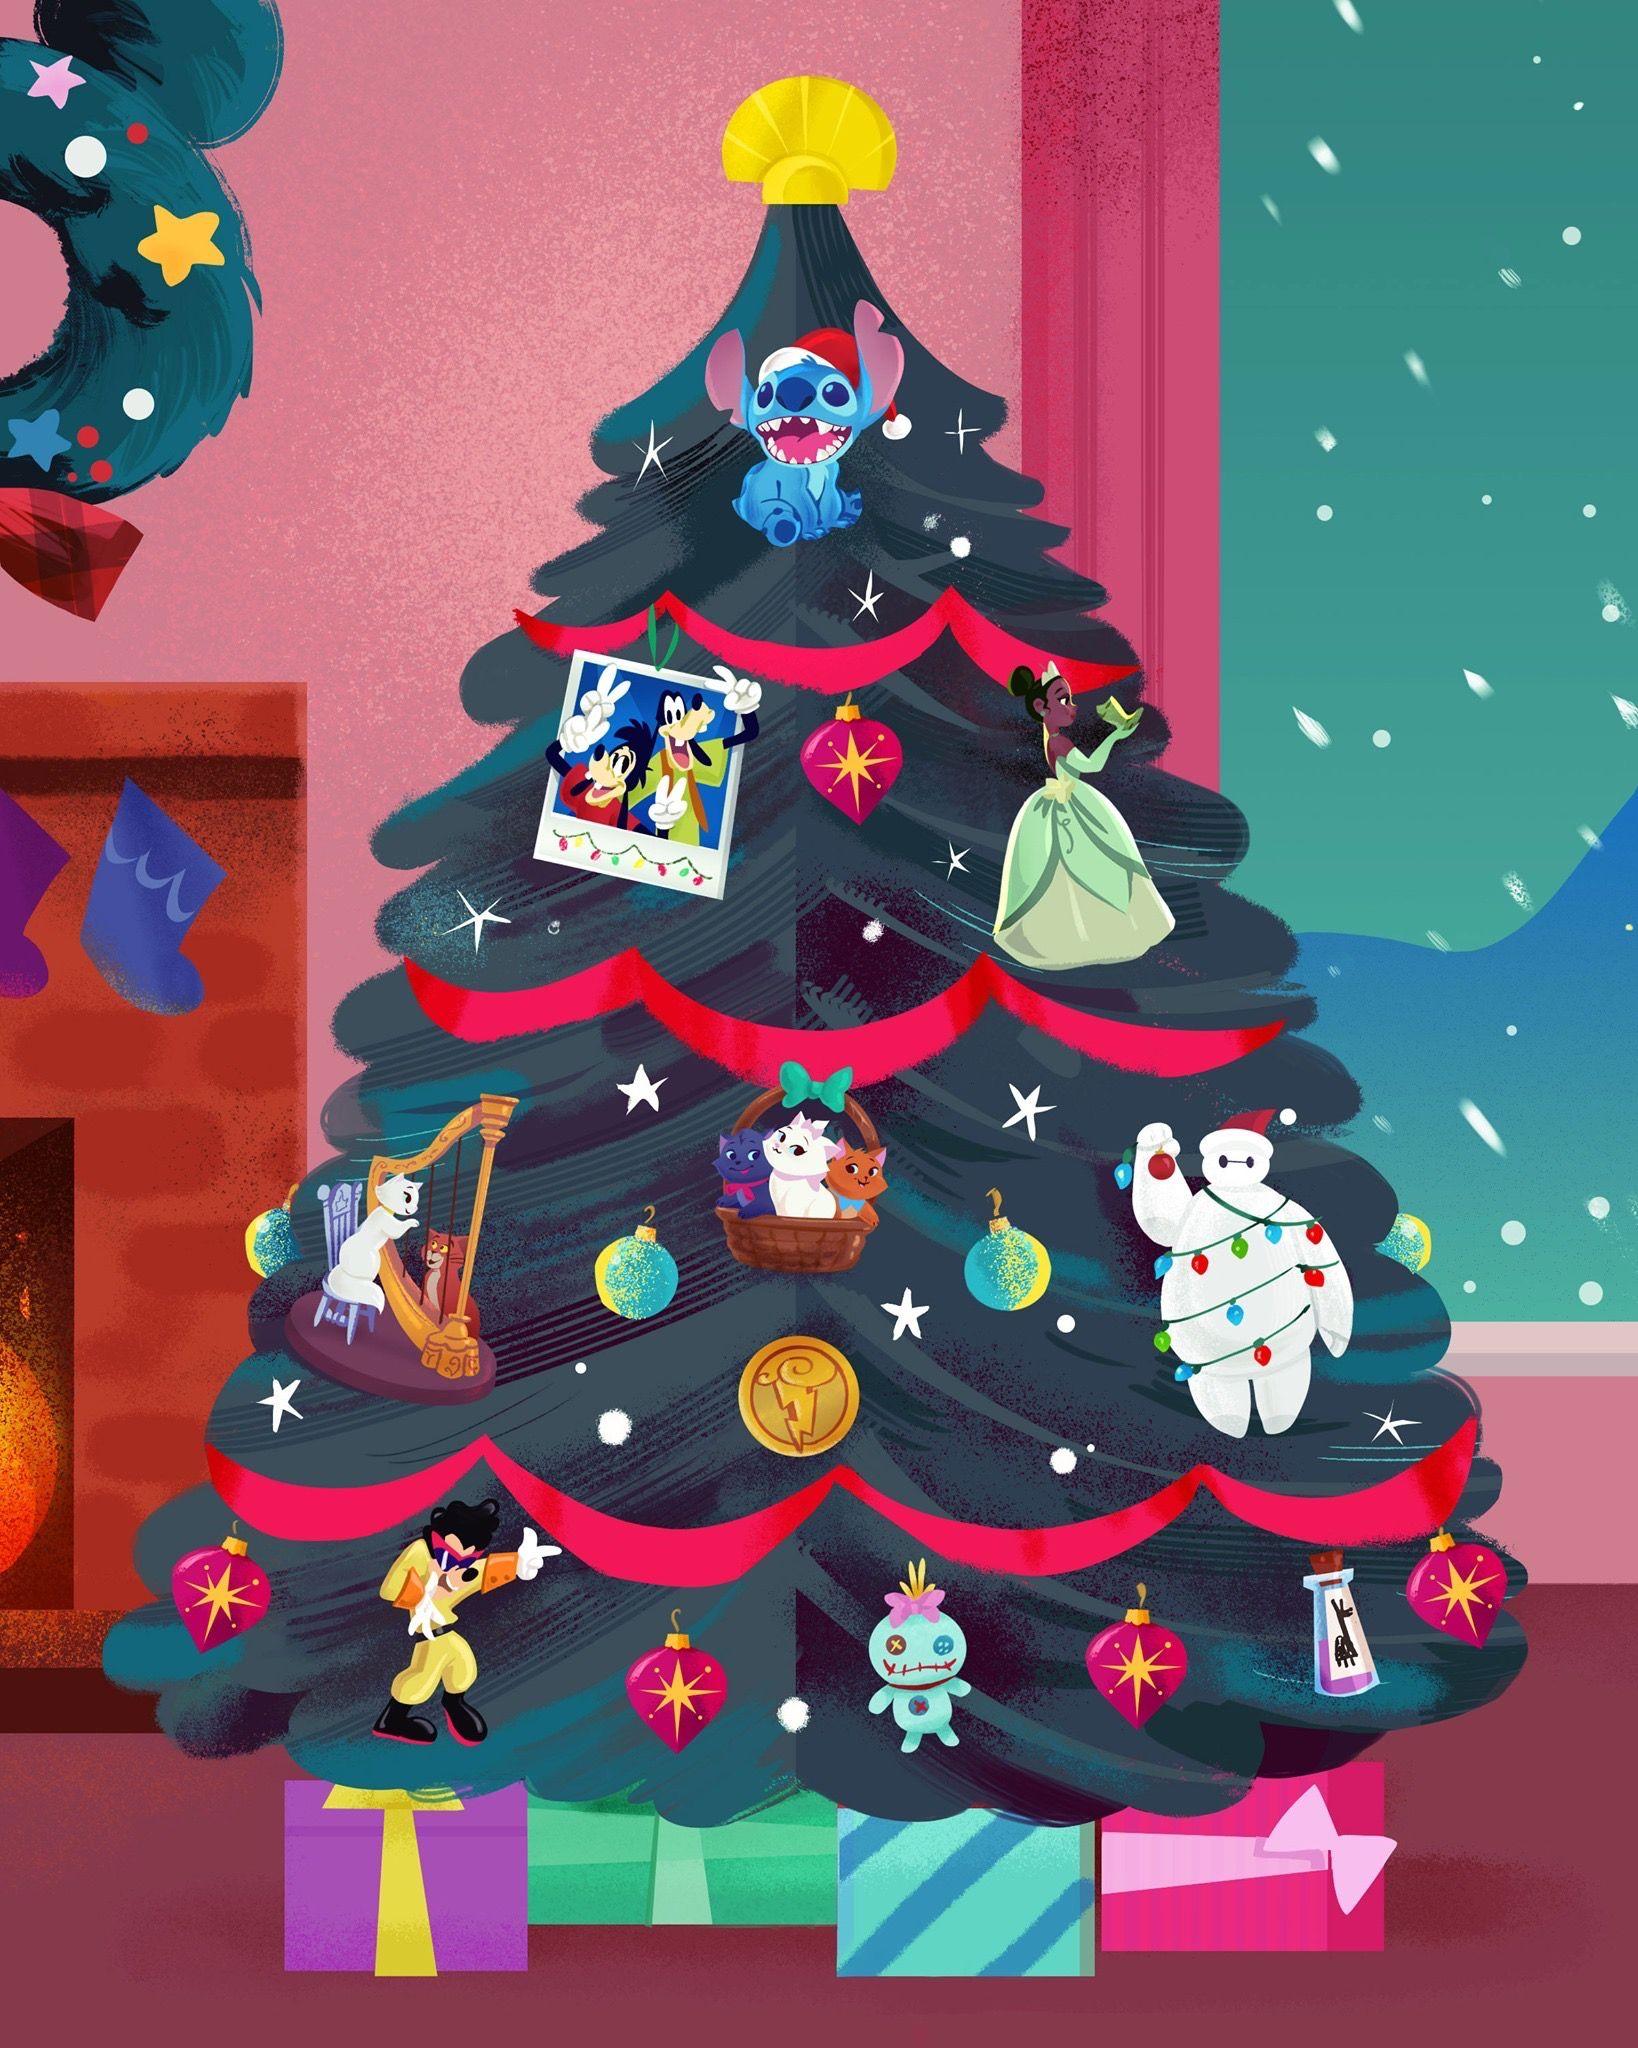 Pin By Wm On Disney Christmas Wallpaper